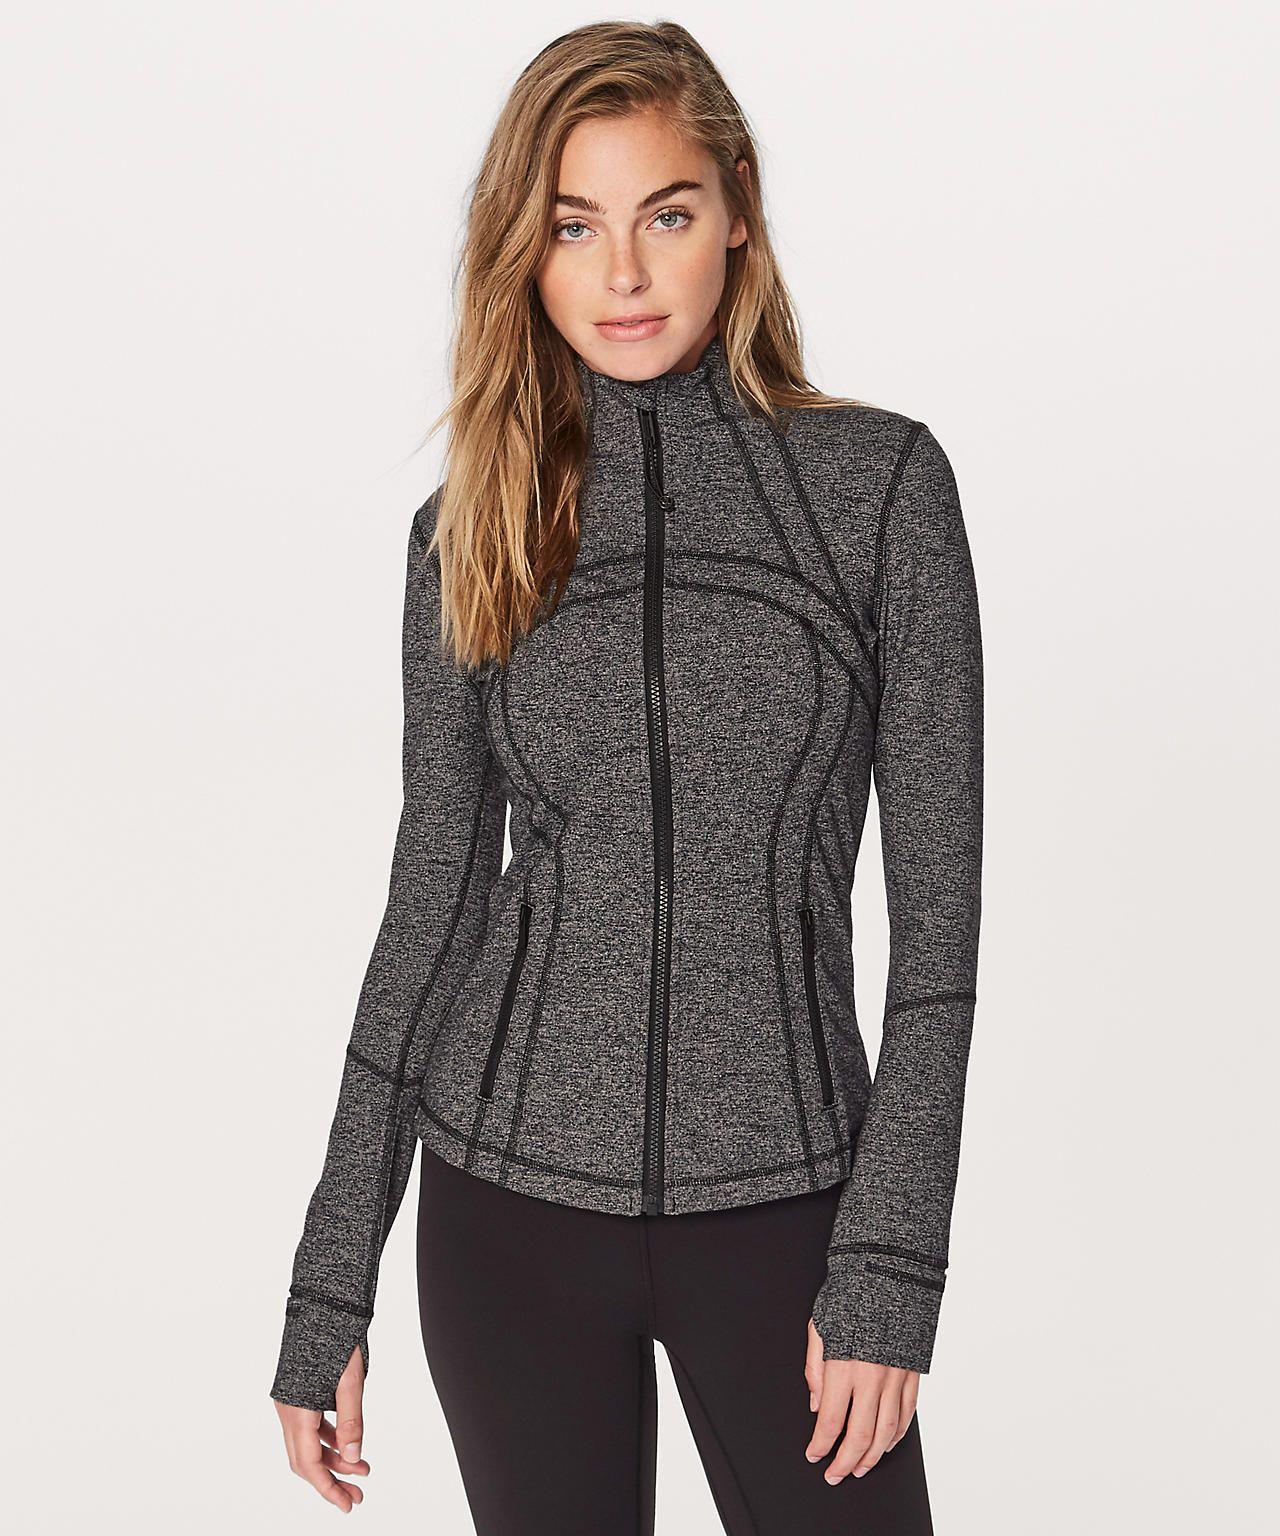 f66e8312646354 Lululemon- Define Jacket in Heathered Black